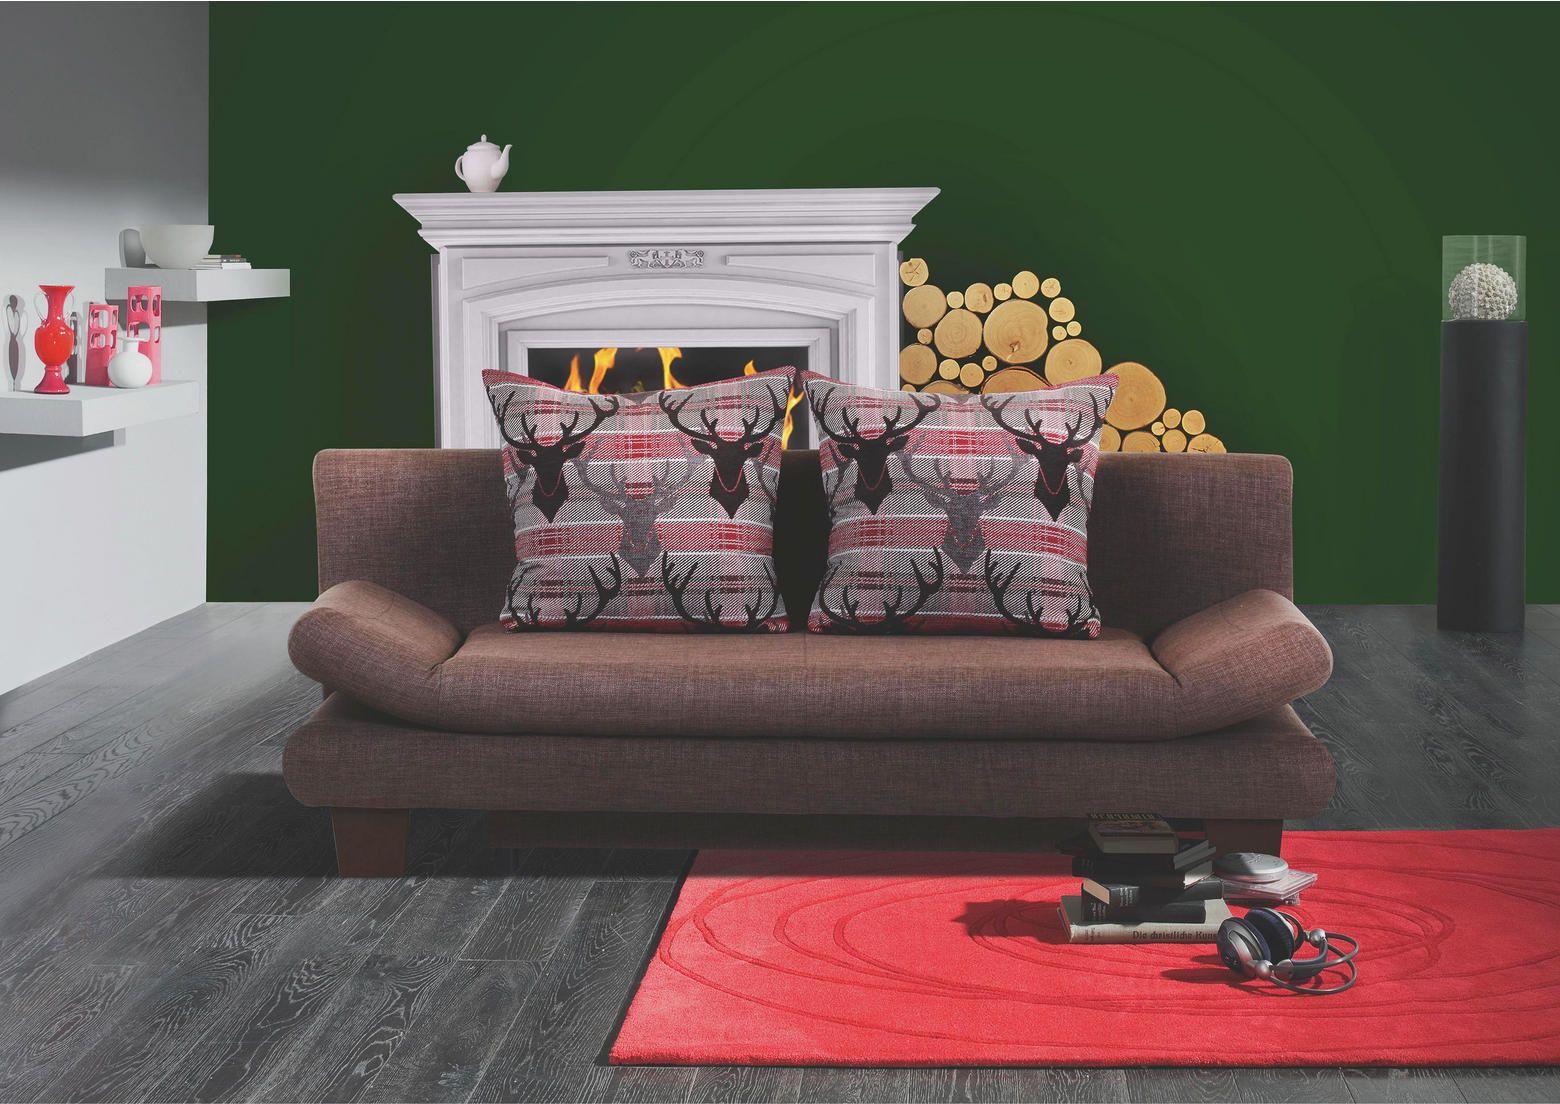 Schlafsofa Braun | Schlafsofa, Sofa, Schlafen